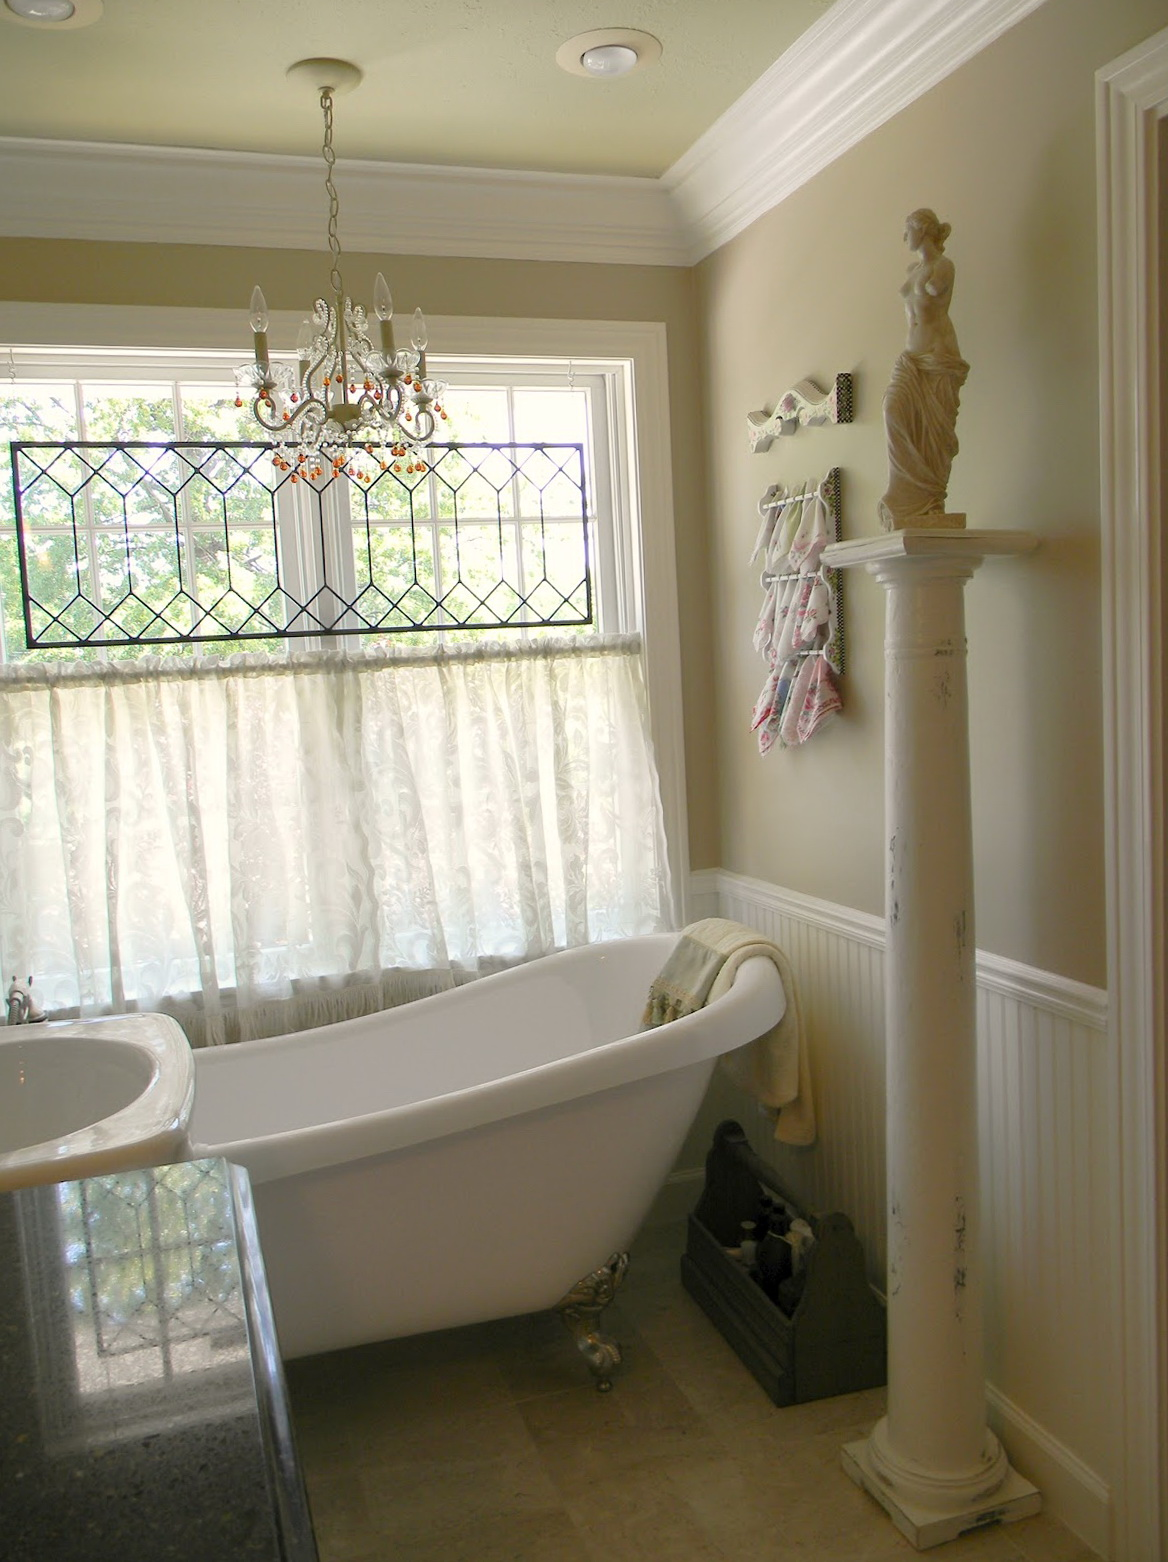 Cafe Curtains For Bathroom Window